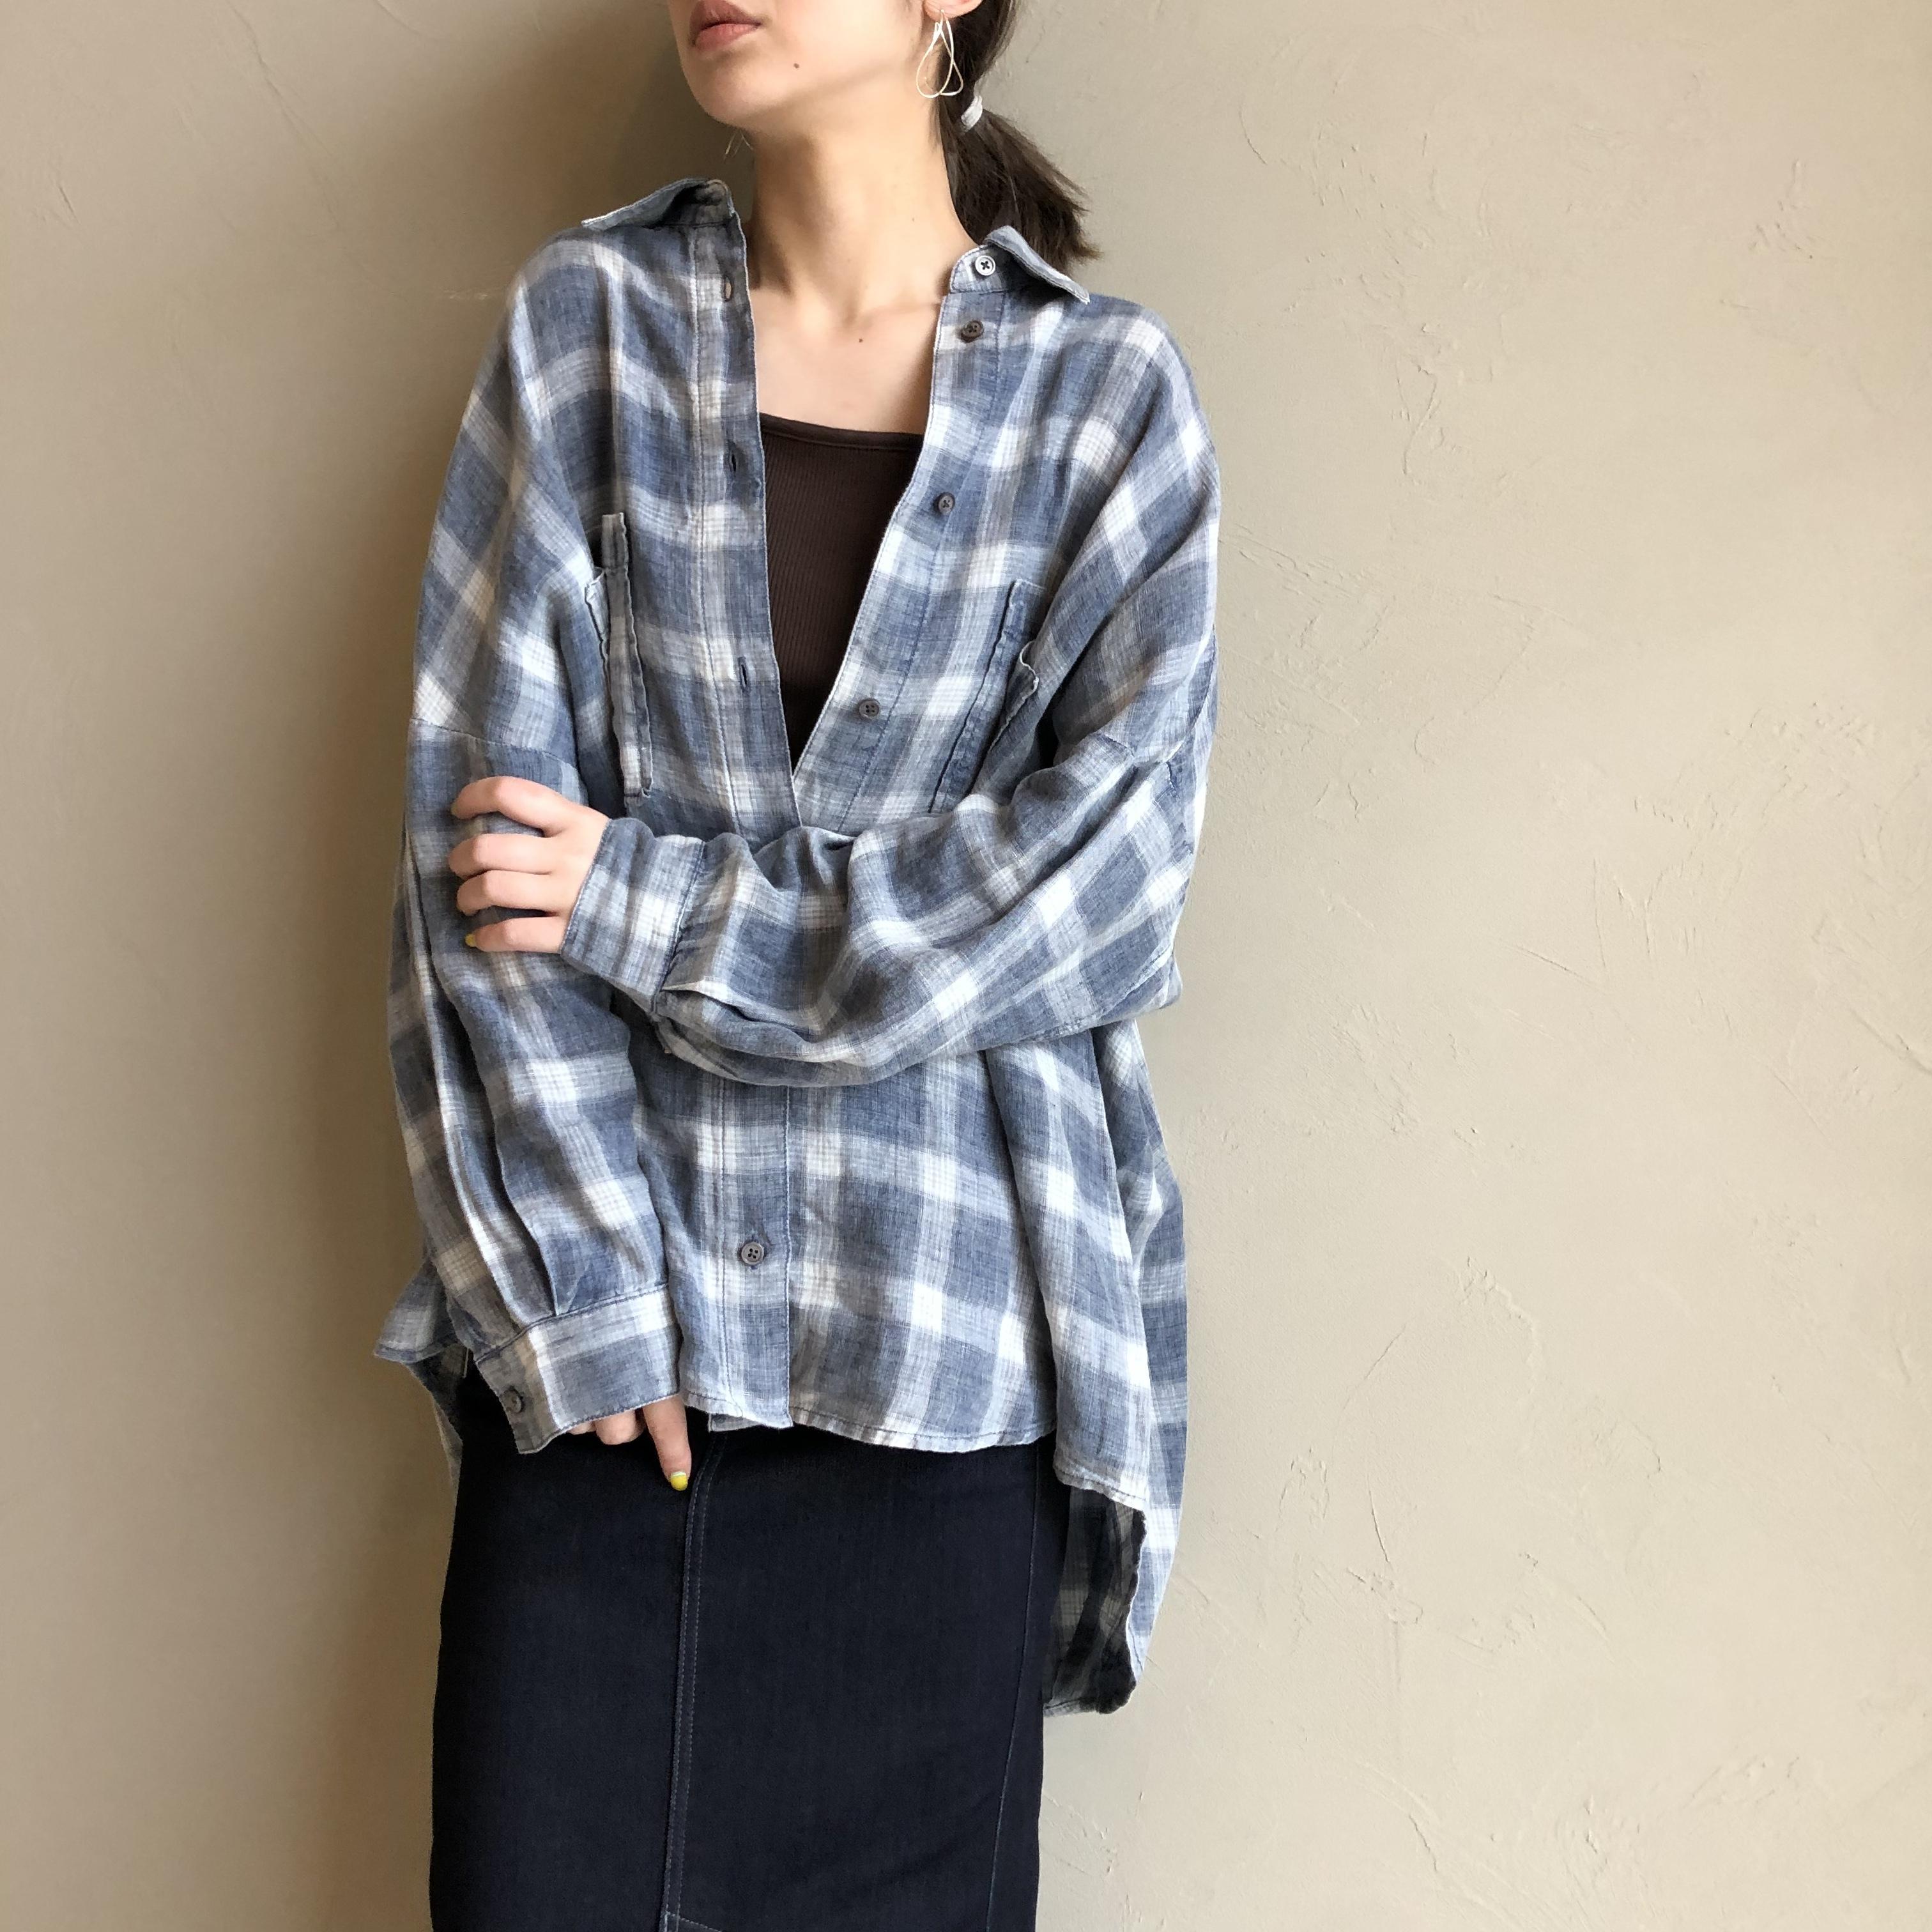 【 CYNICAL 】- 112-95142 - ビッグデニムチェックシャツ